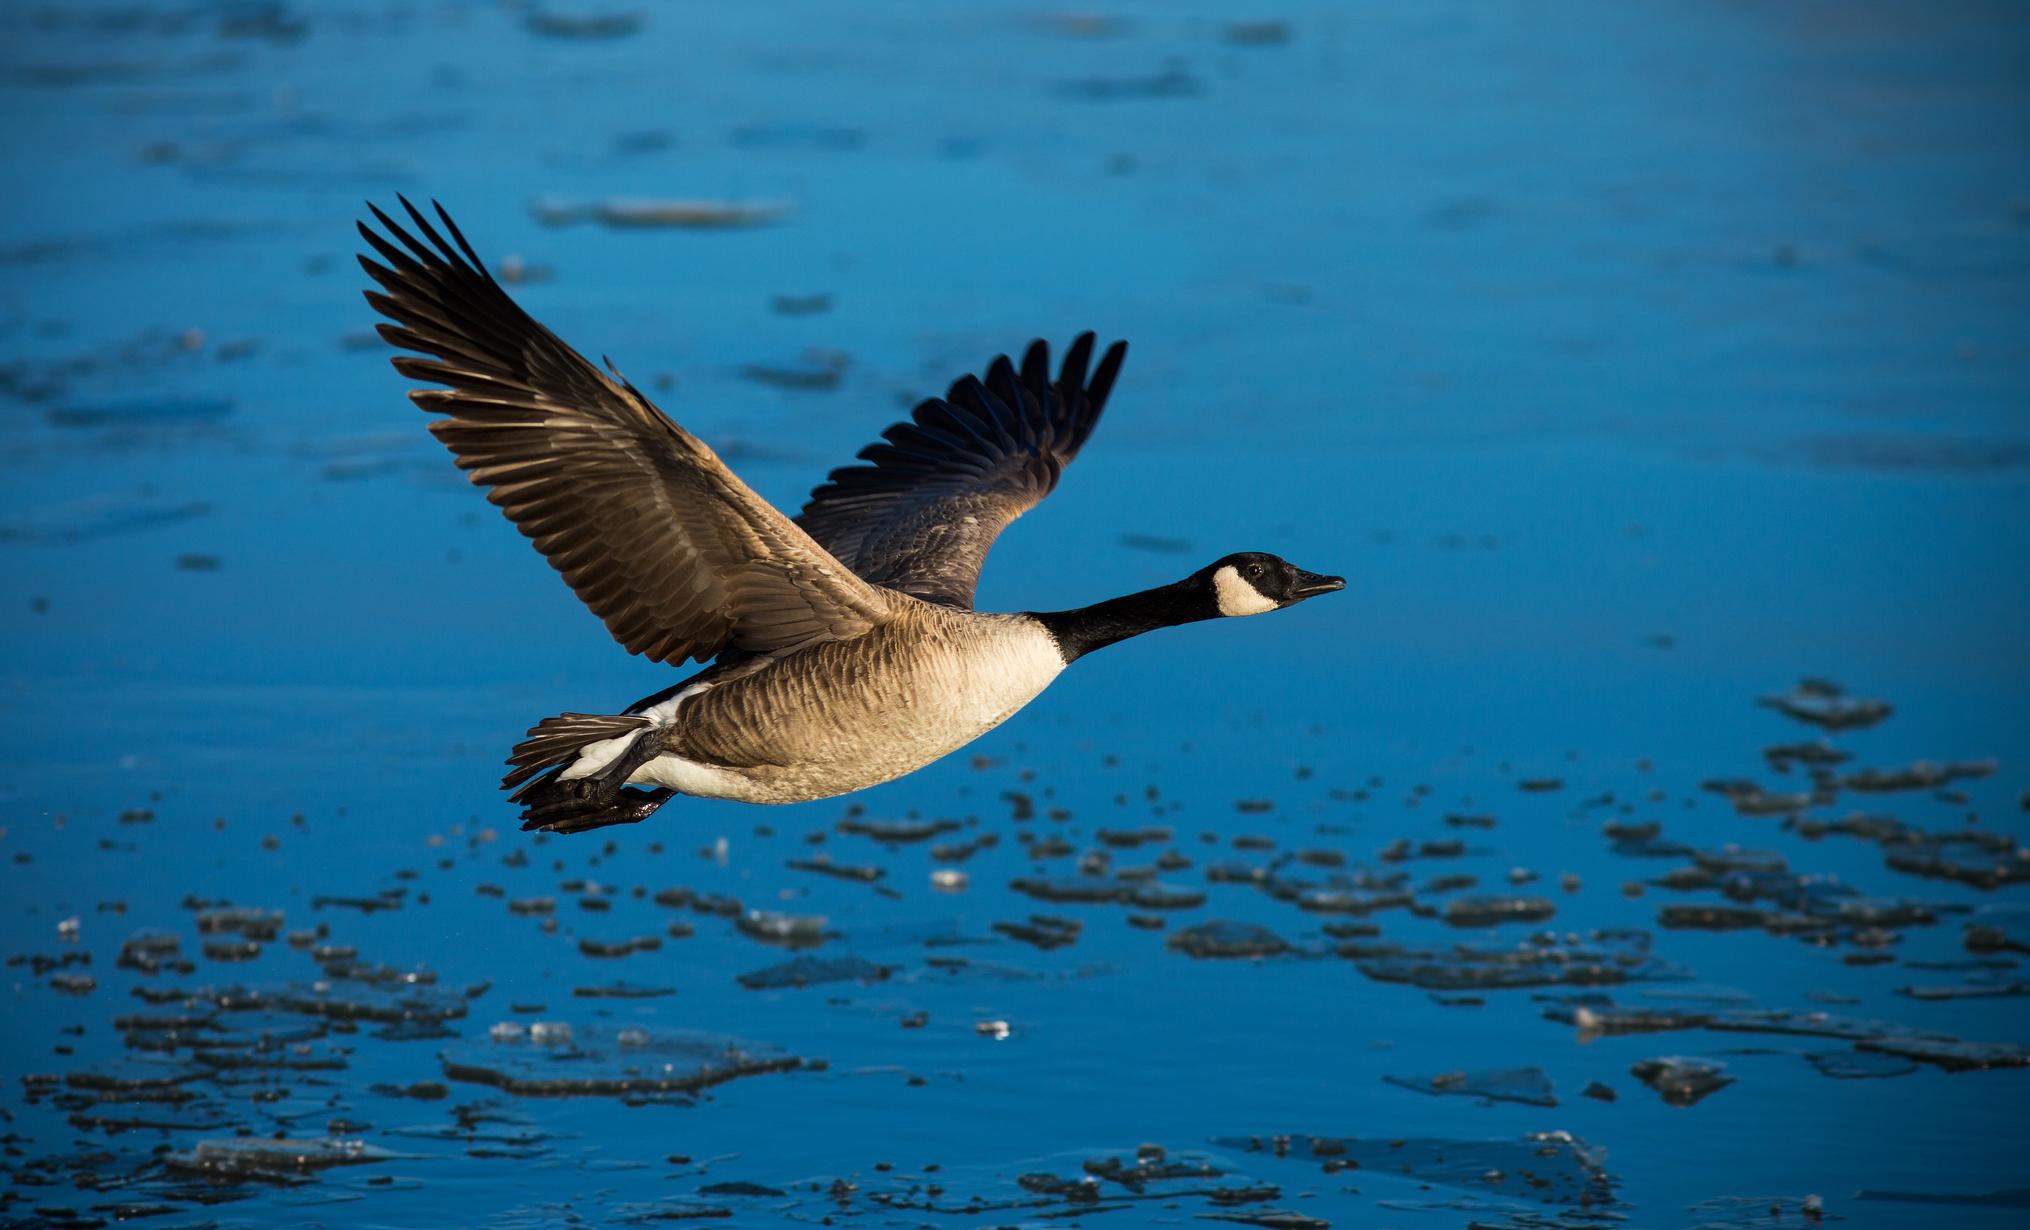 Wallpaper bird duck wings flying freedom water wallpapers animals 2030x1230